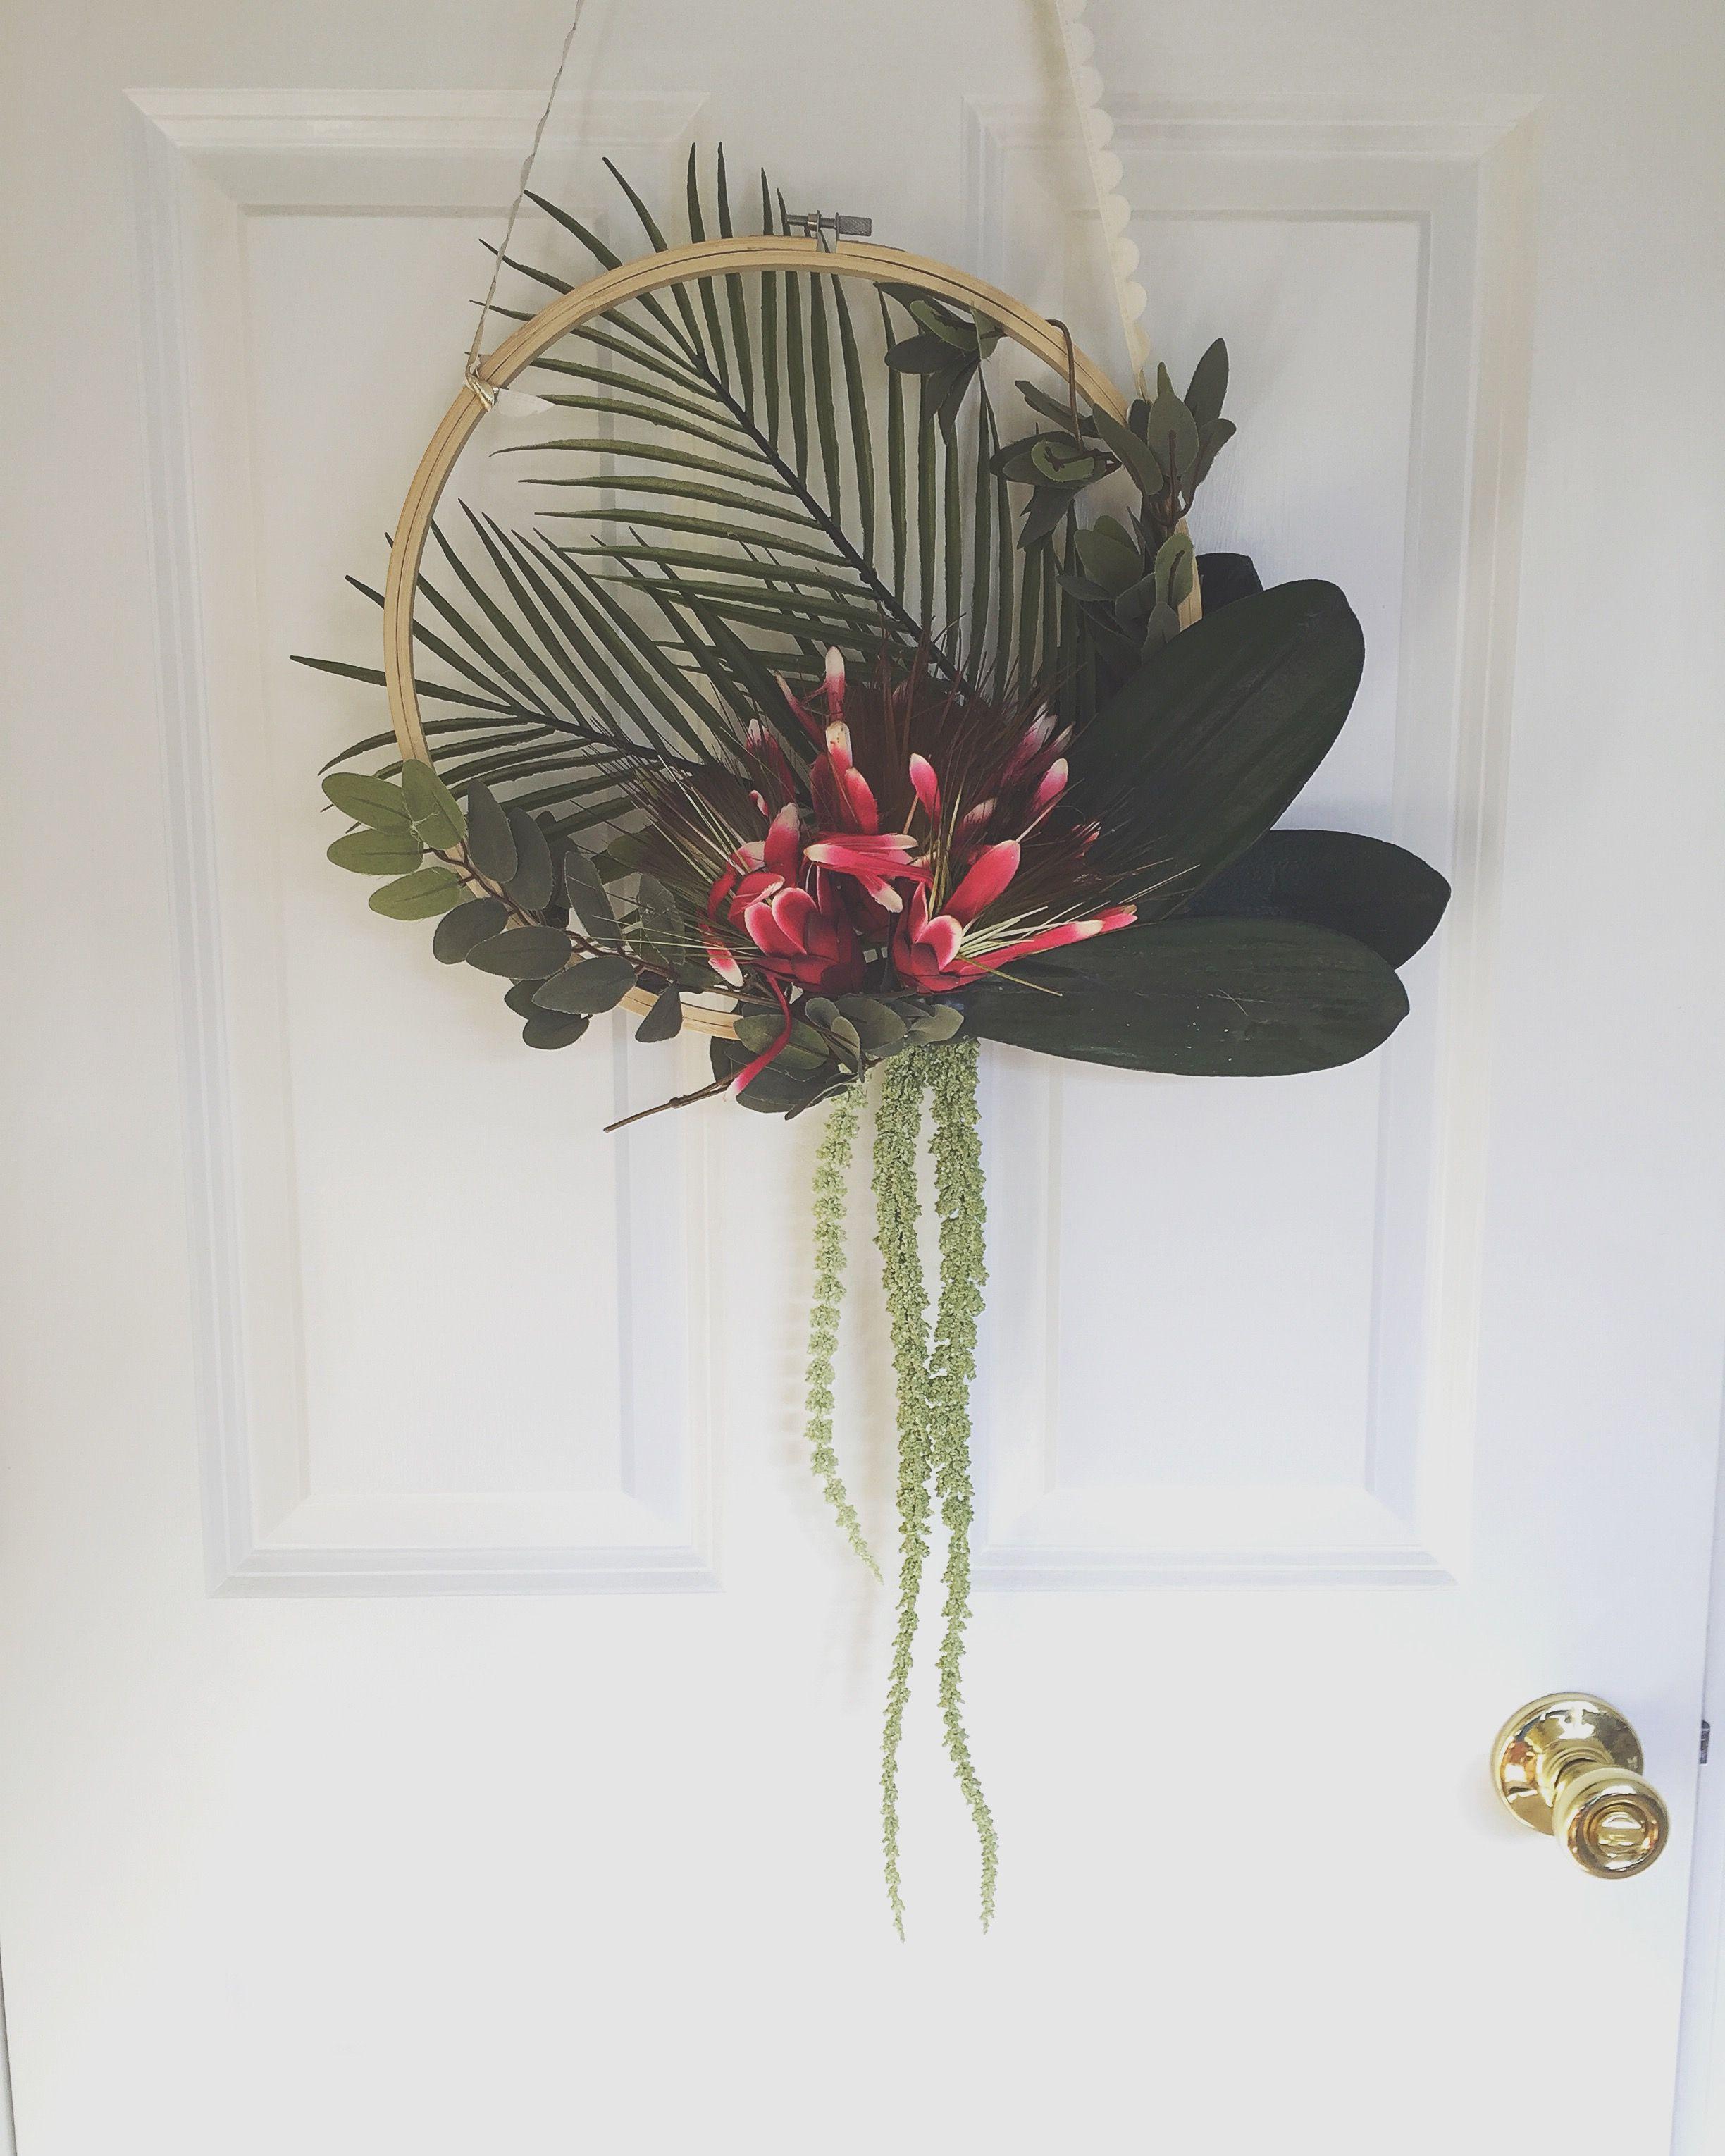 embroidery hoop wreath summer wreath tropical wreath boho